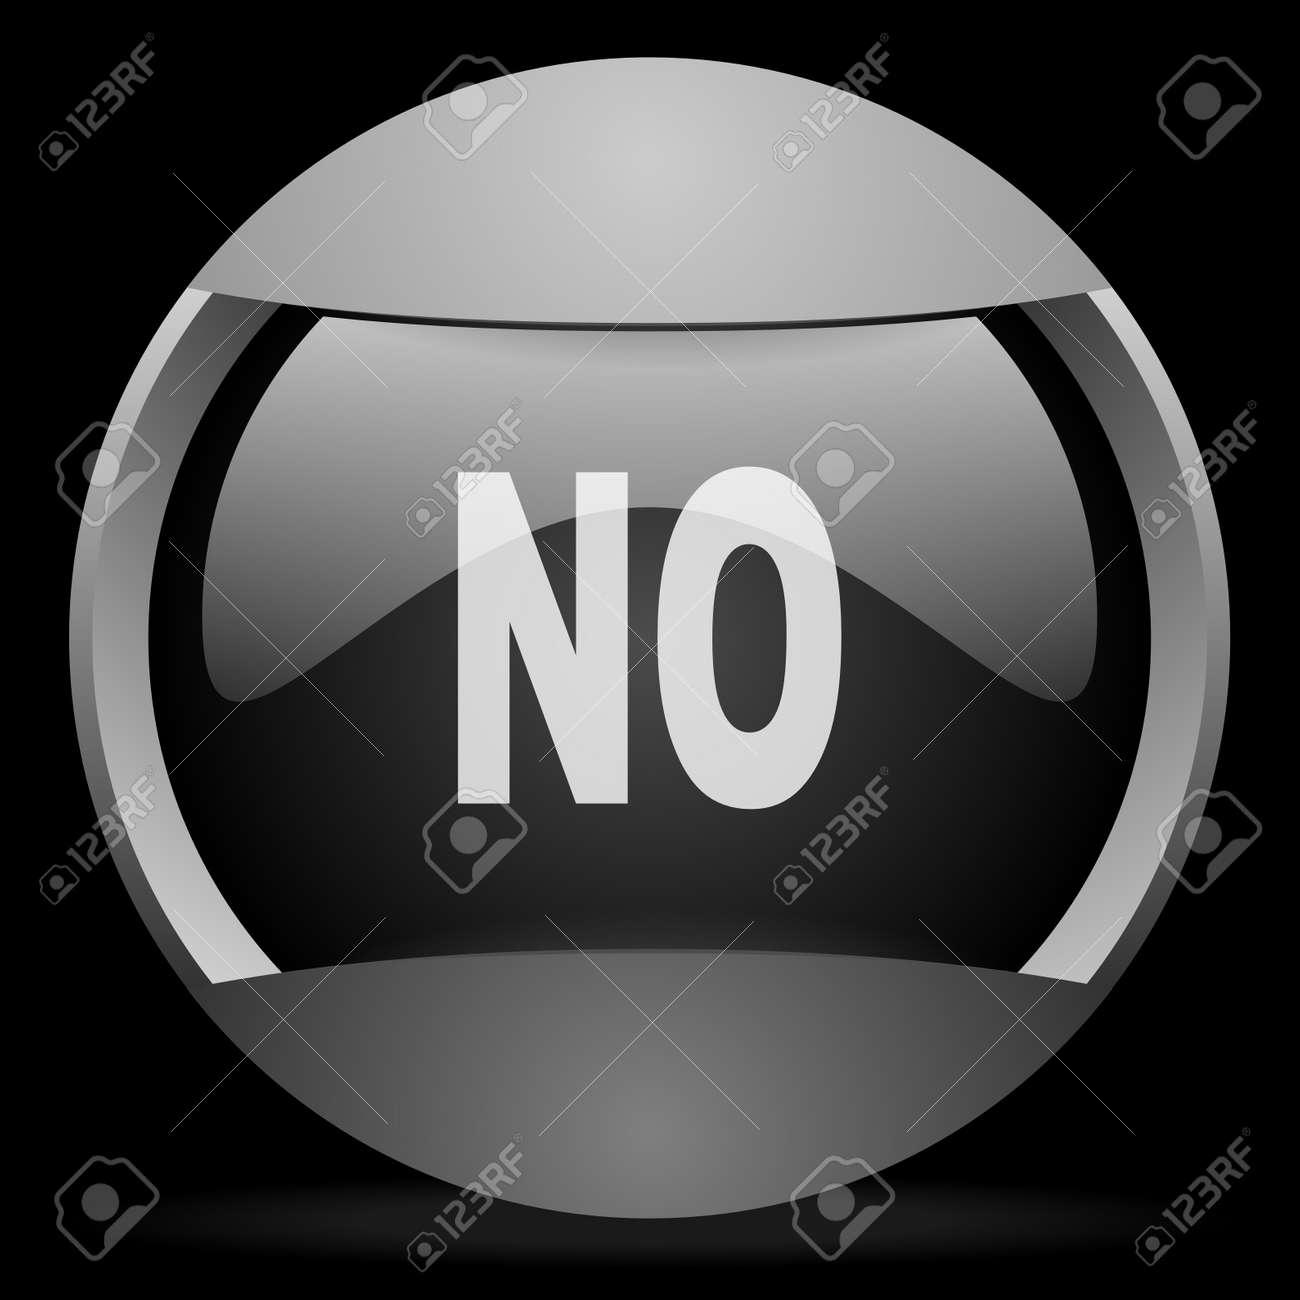 no round gray web icon on black background Stock Photo - 16314499